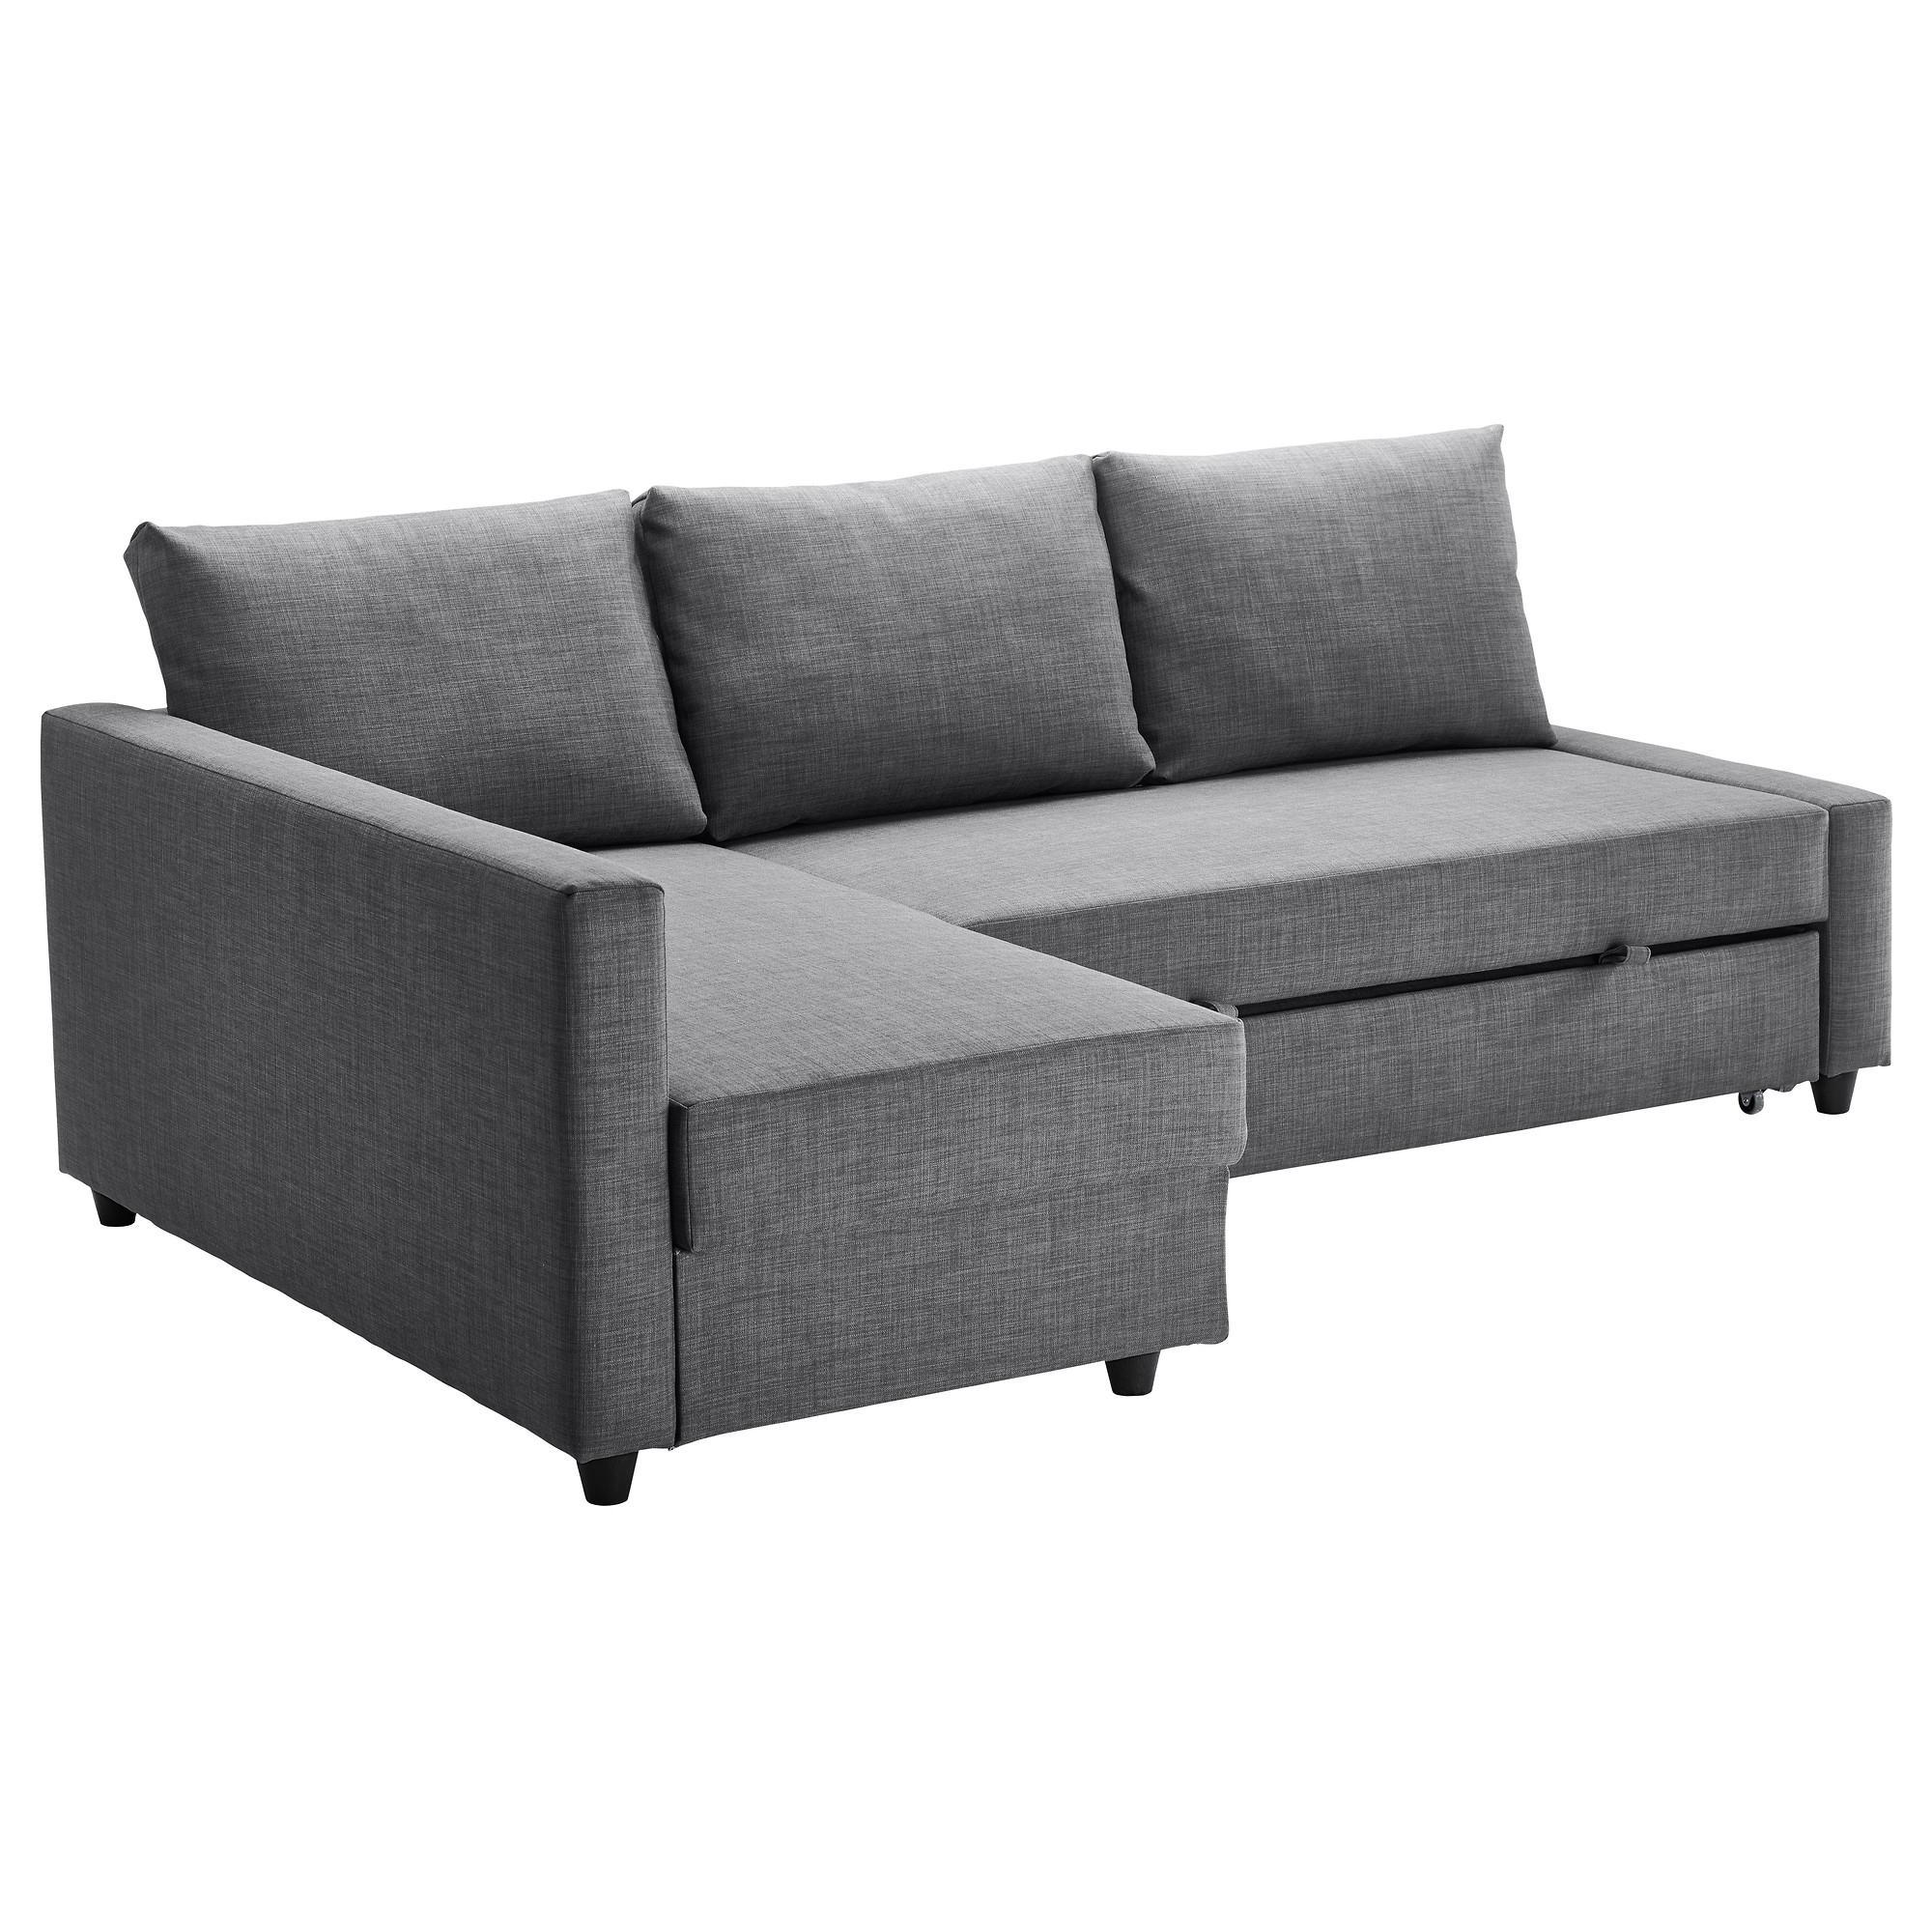 Ikea Loveseat Sleeper Sofas Inside Best And Newest Friheten Sleeper Sectional,3 Seat W/storage – Skiftebo Dark Gray (View 10 of 20)